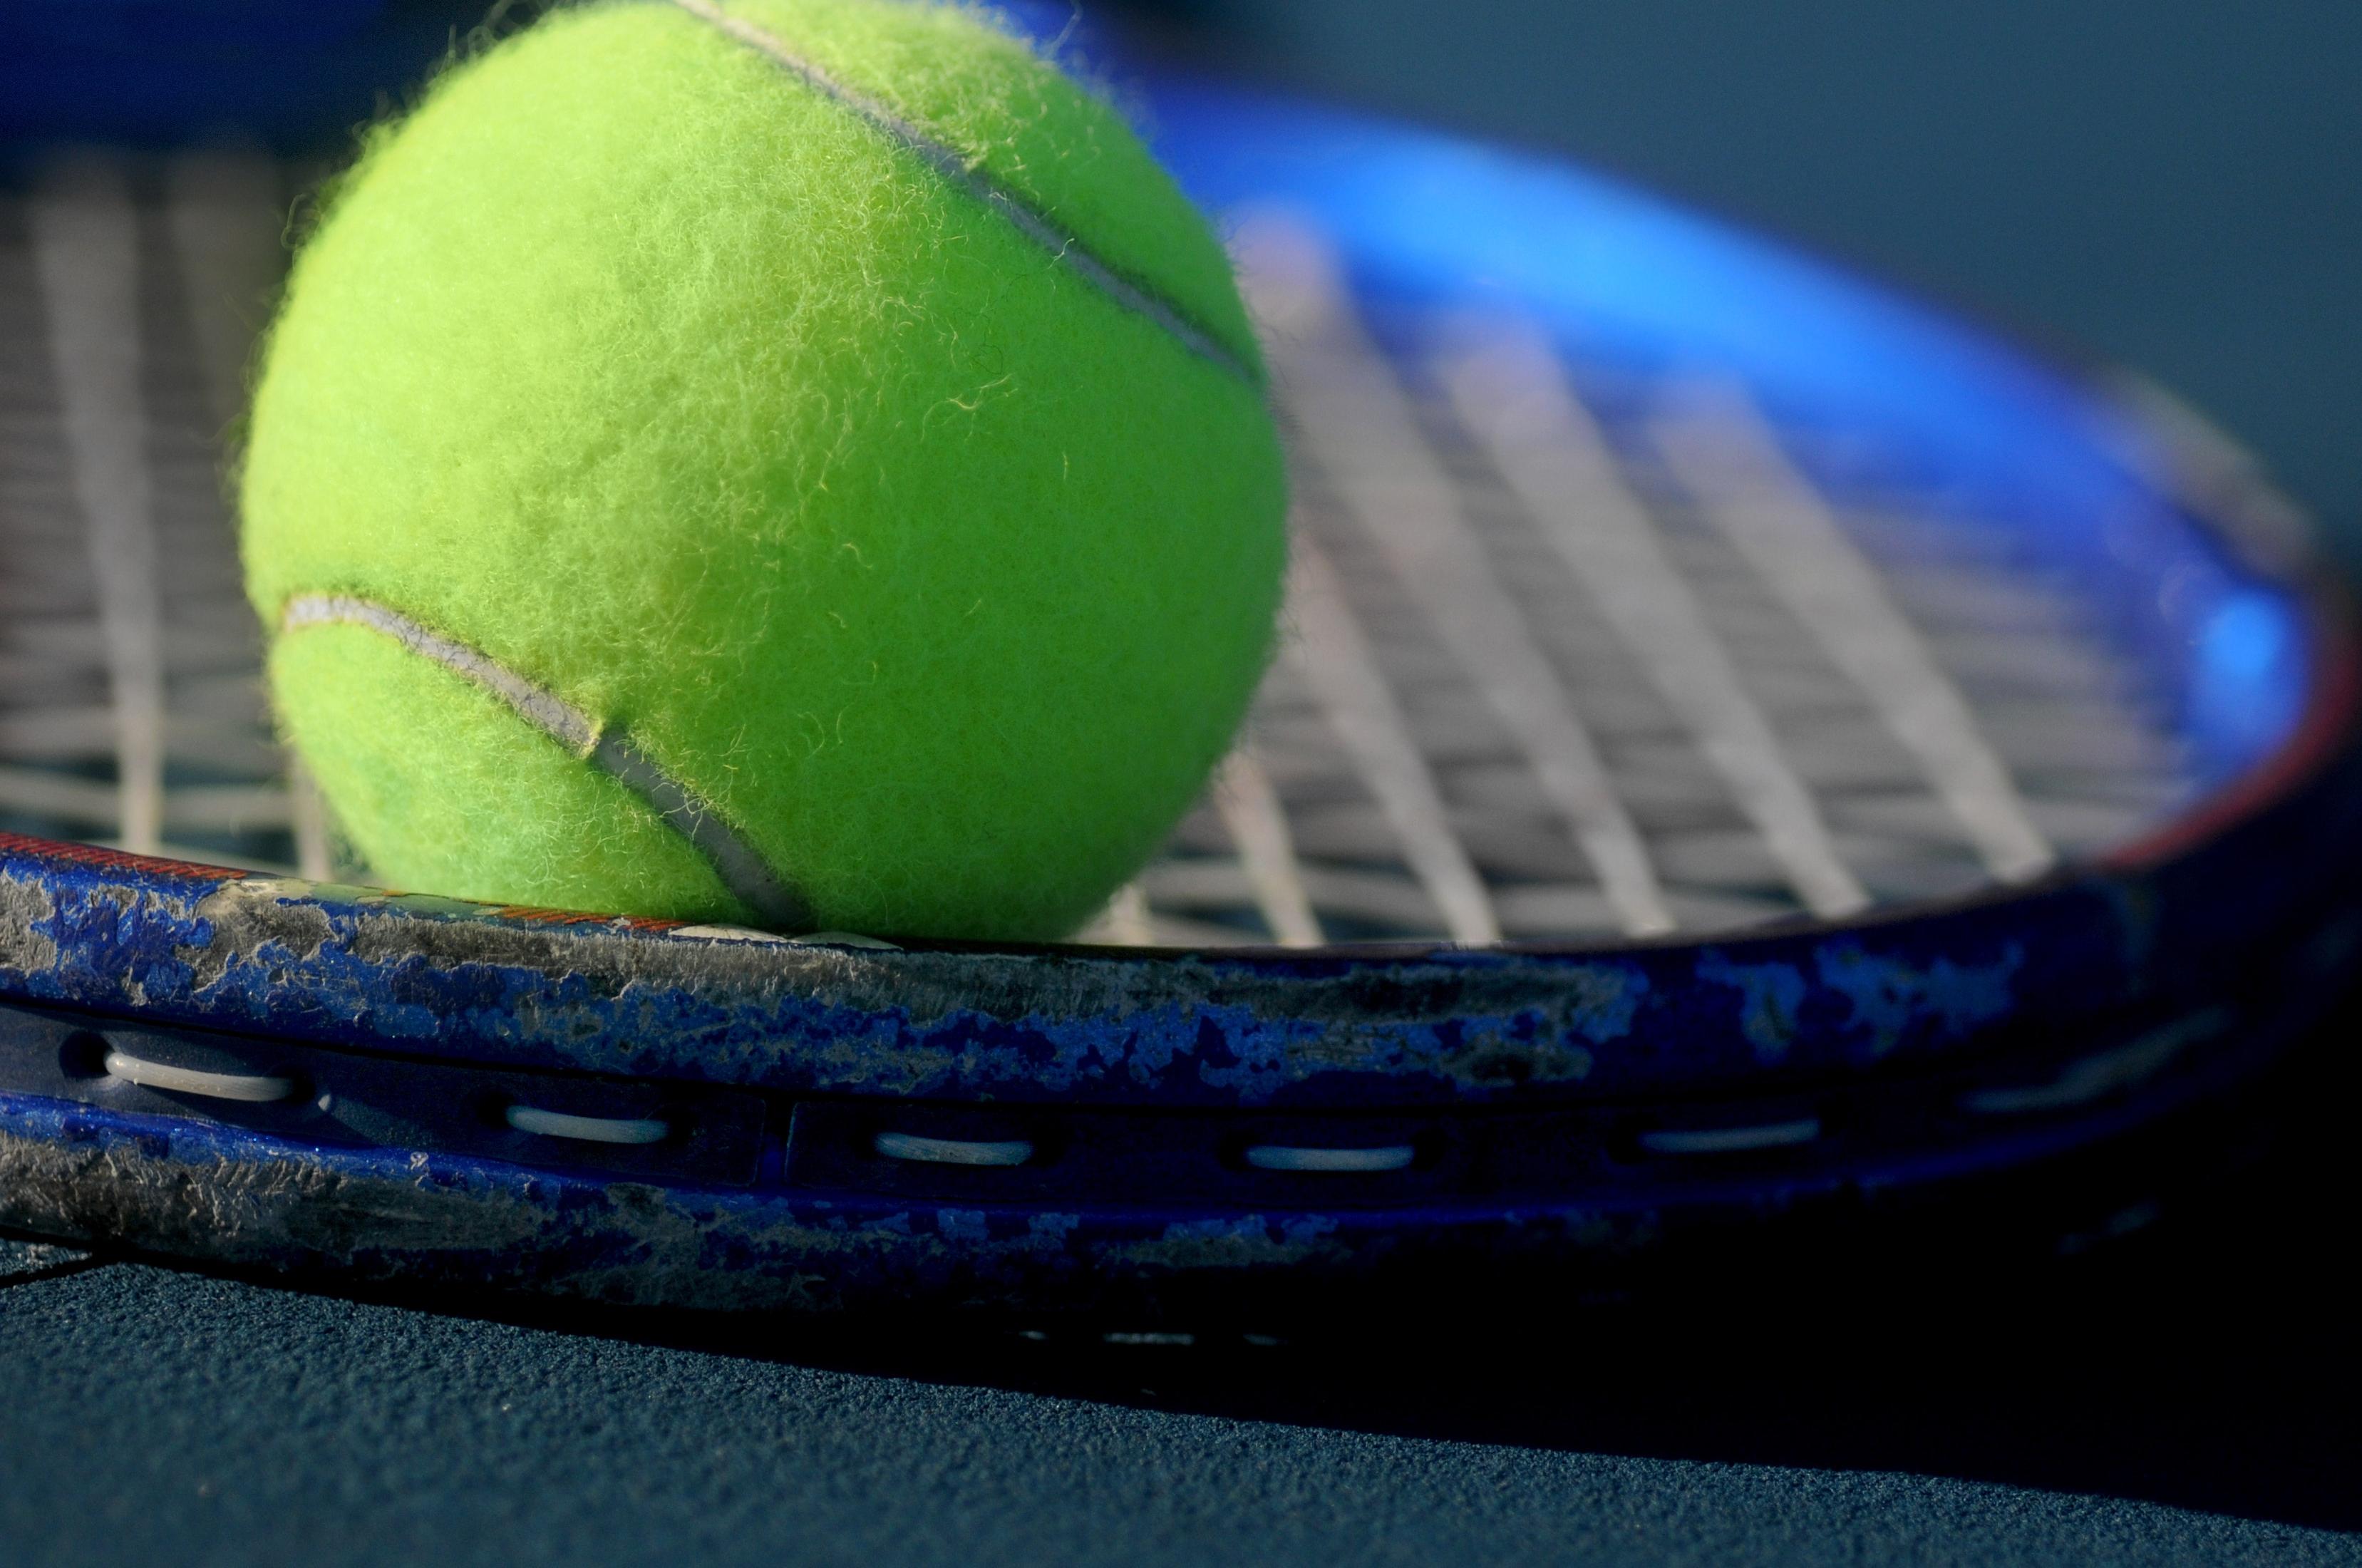 Tennis kick-off event